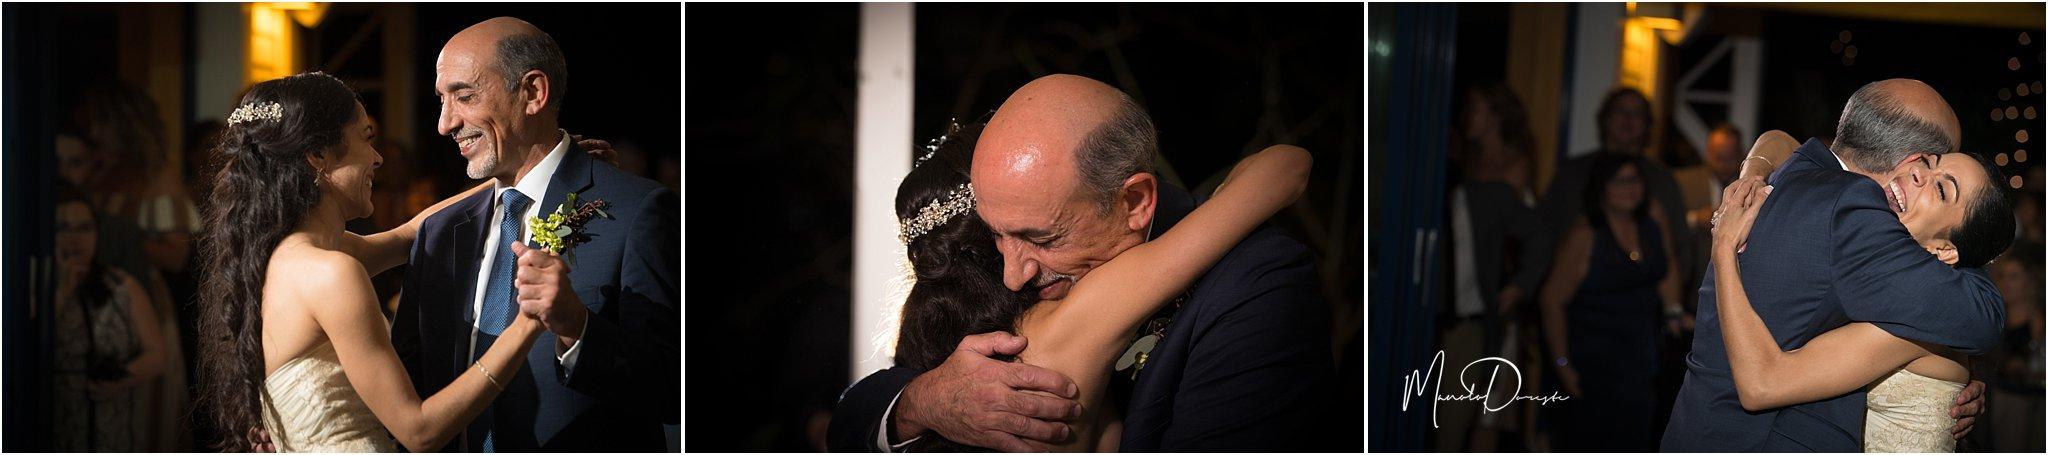 0524_ManoloDoreste_InFocusStudios_Wedding_Family_Photography_Miami_MiamiPhotographer.jpg